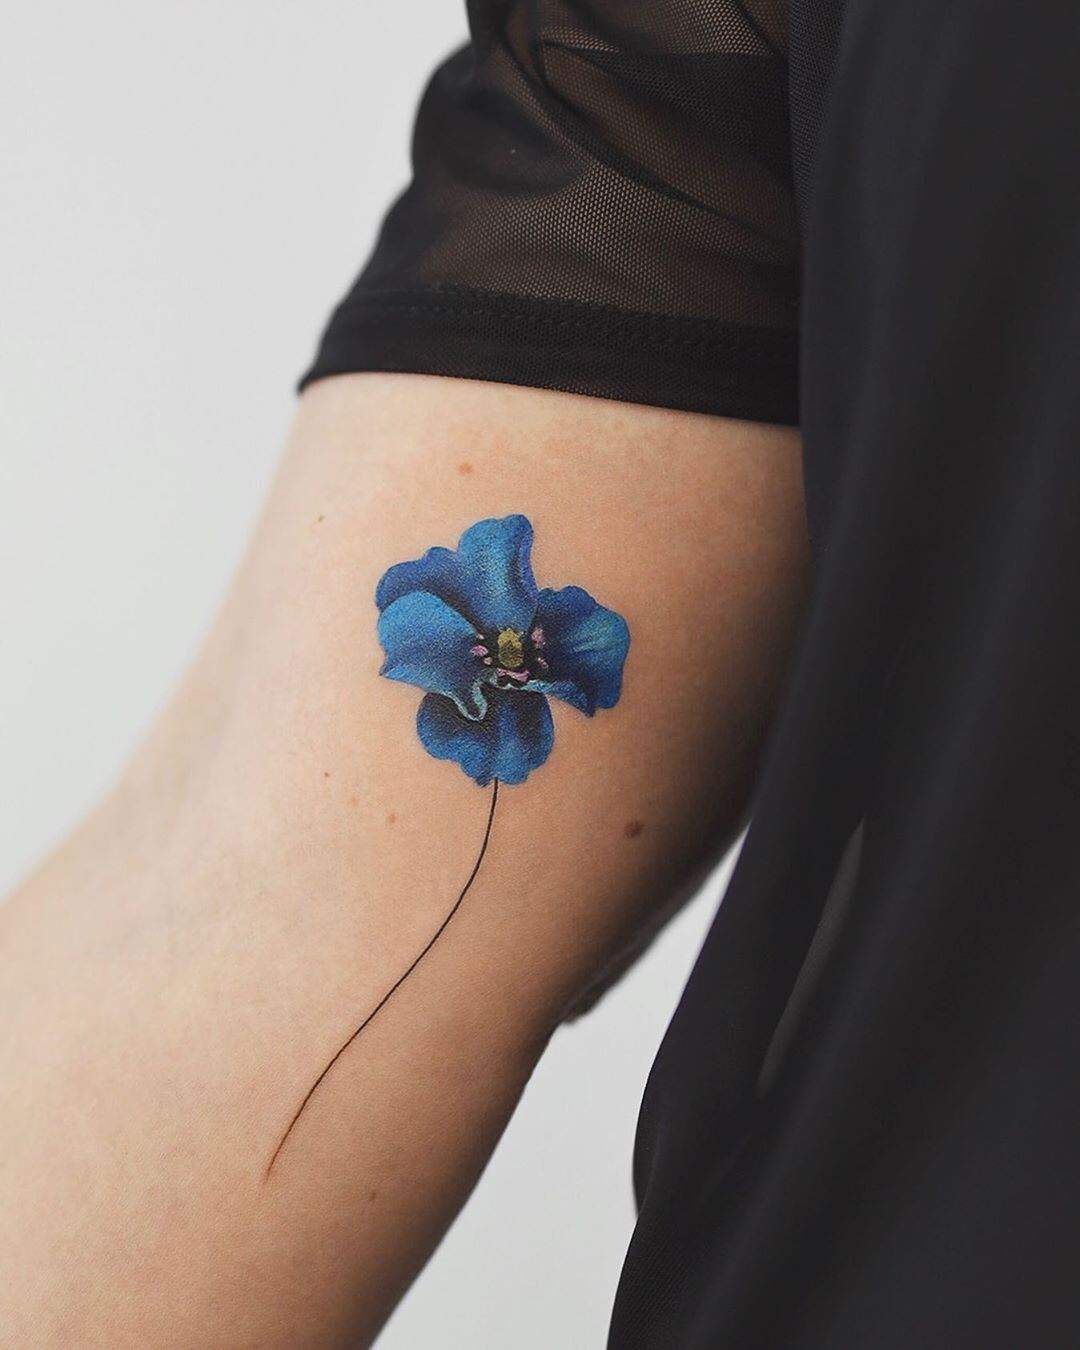 Himalayan blue poppy tattoo by Rey Jasper